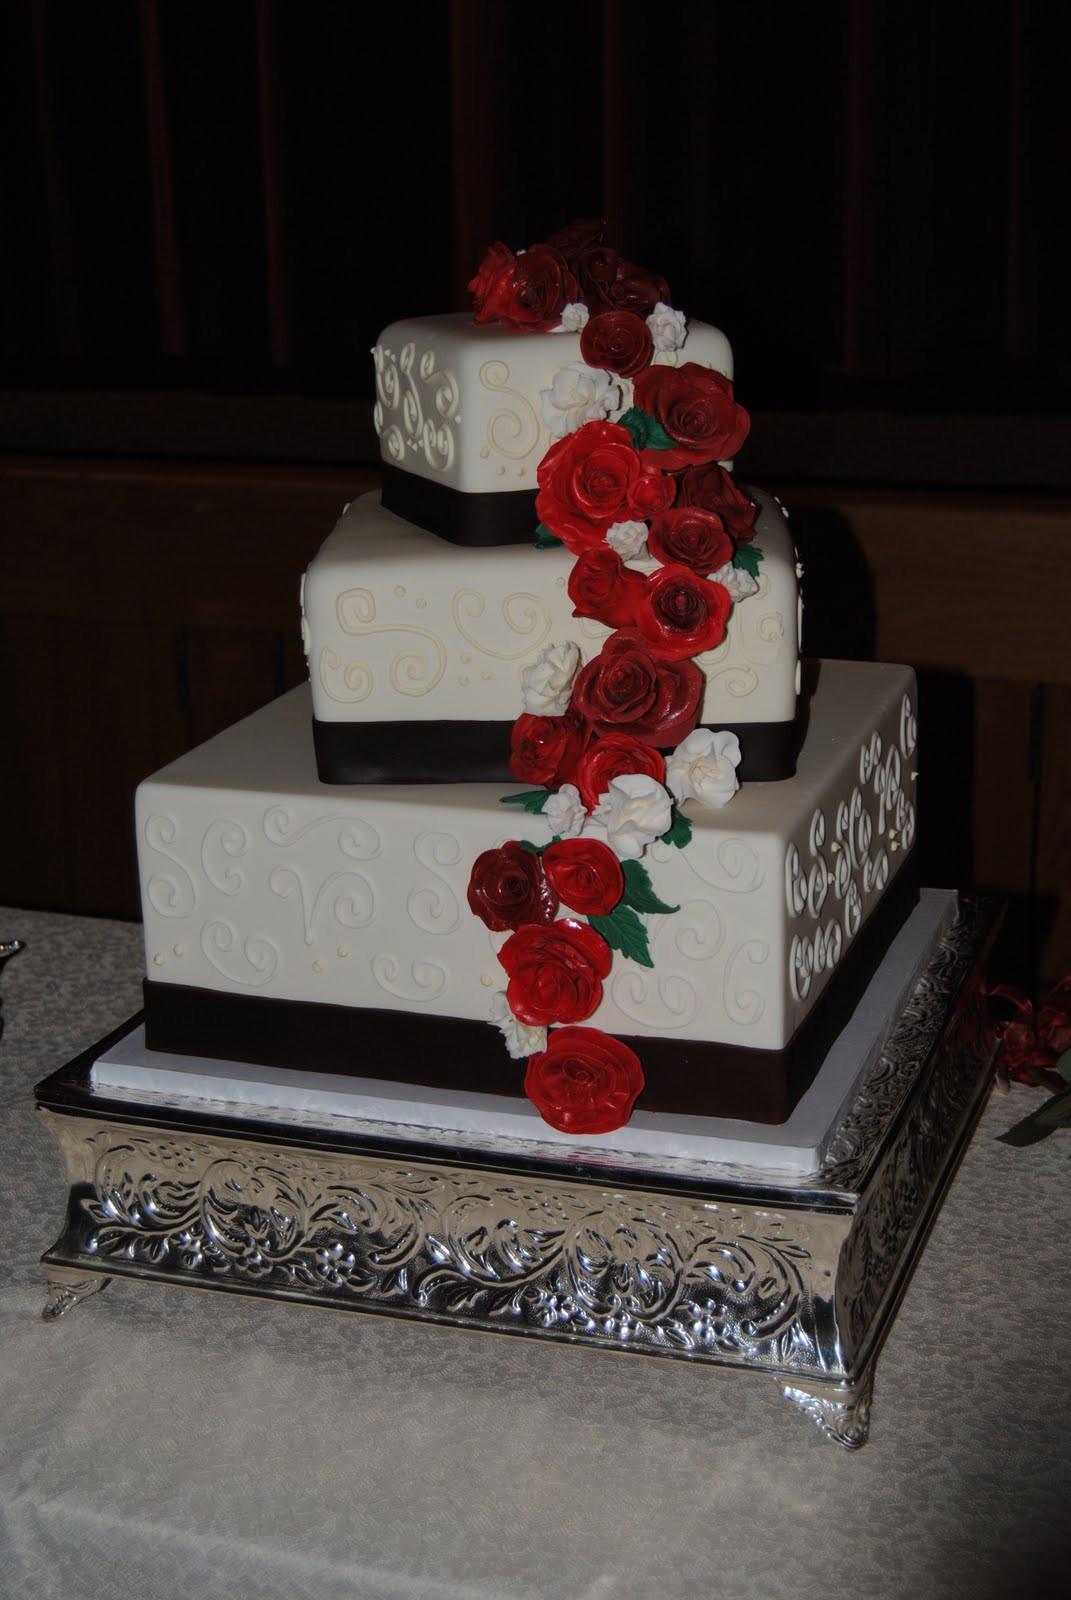 Square Wedding Cakes Pictures  Wedding cake pictures square idea in 2017